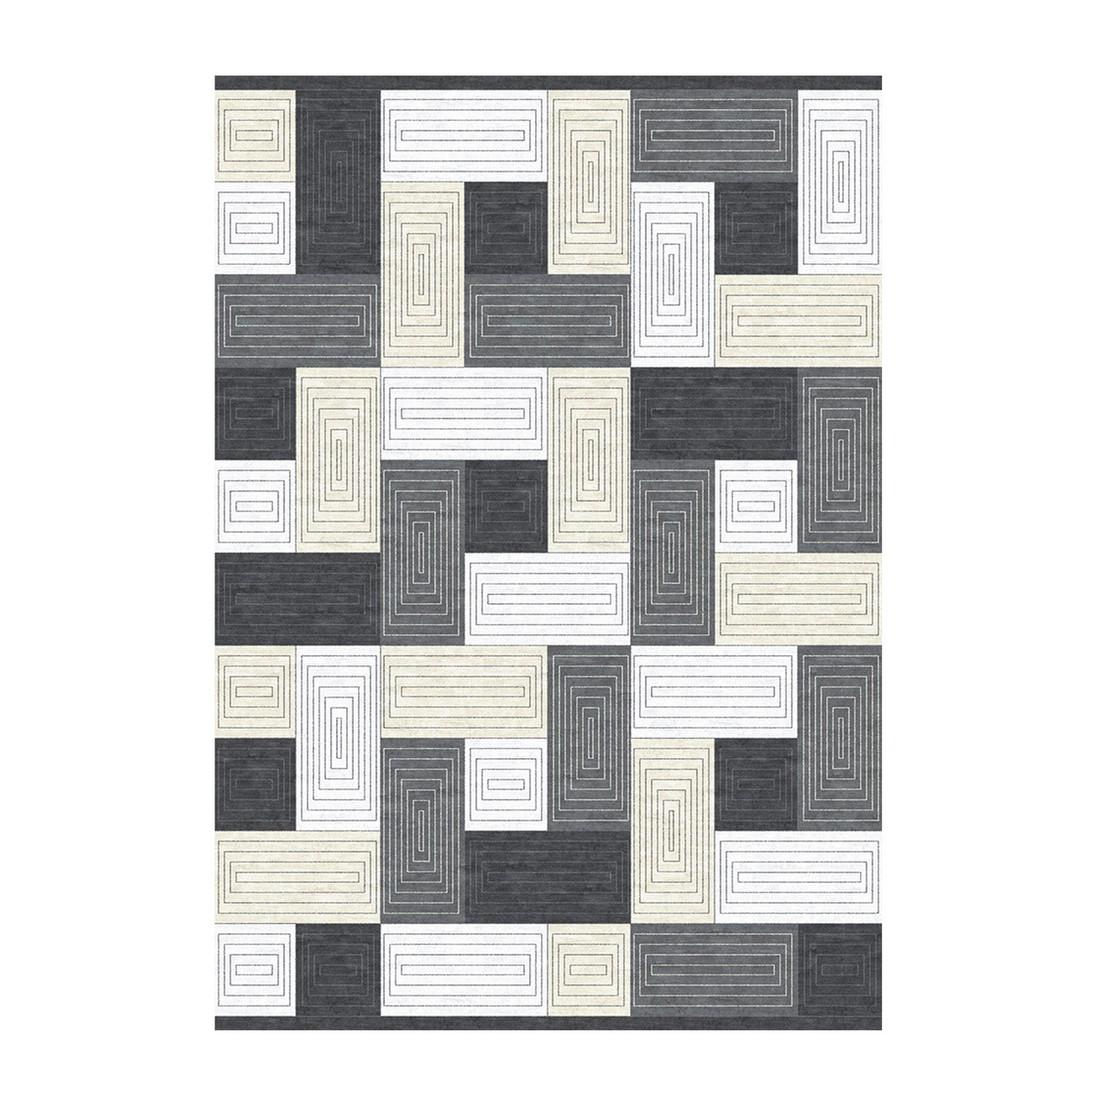 Teppich Efsun Ekin – Grau – Maße: 200 x 290 cm, Kayoom günstig